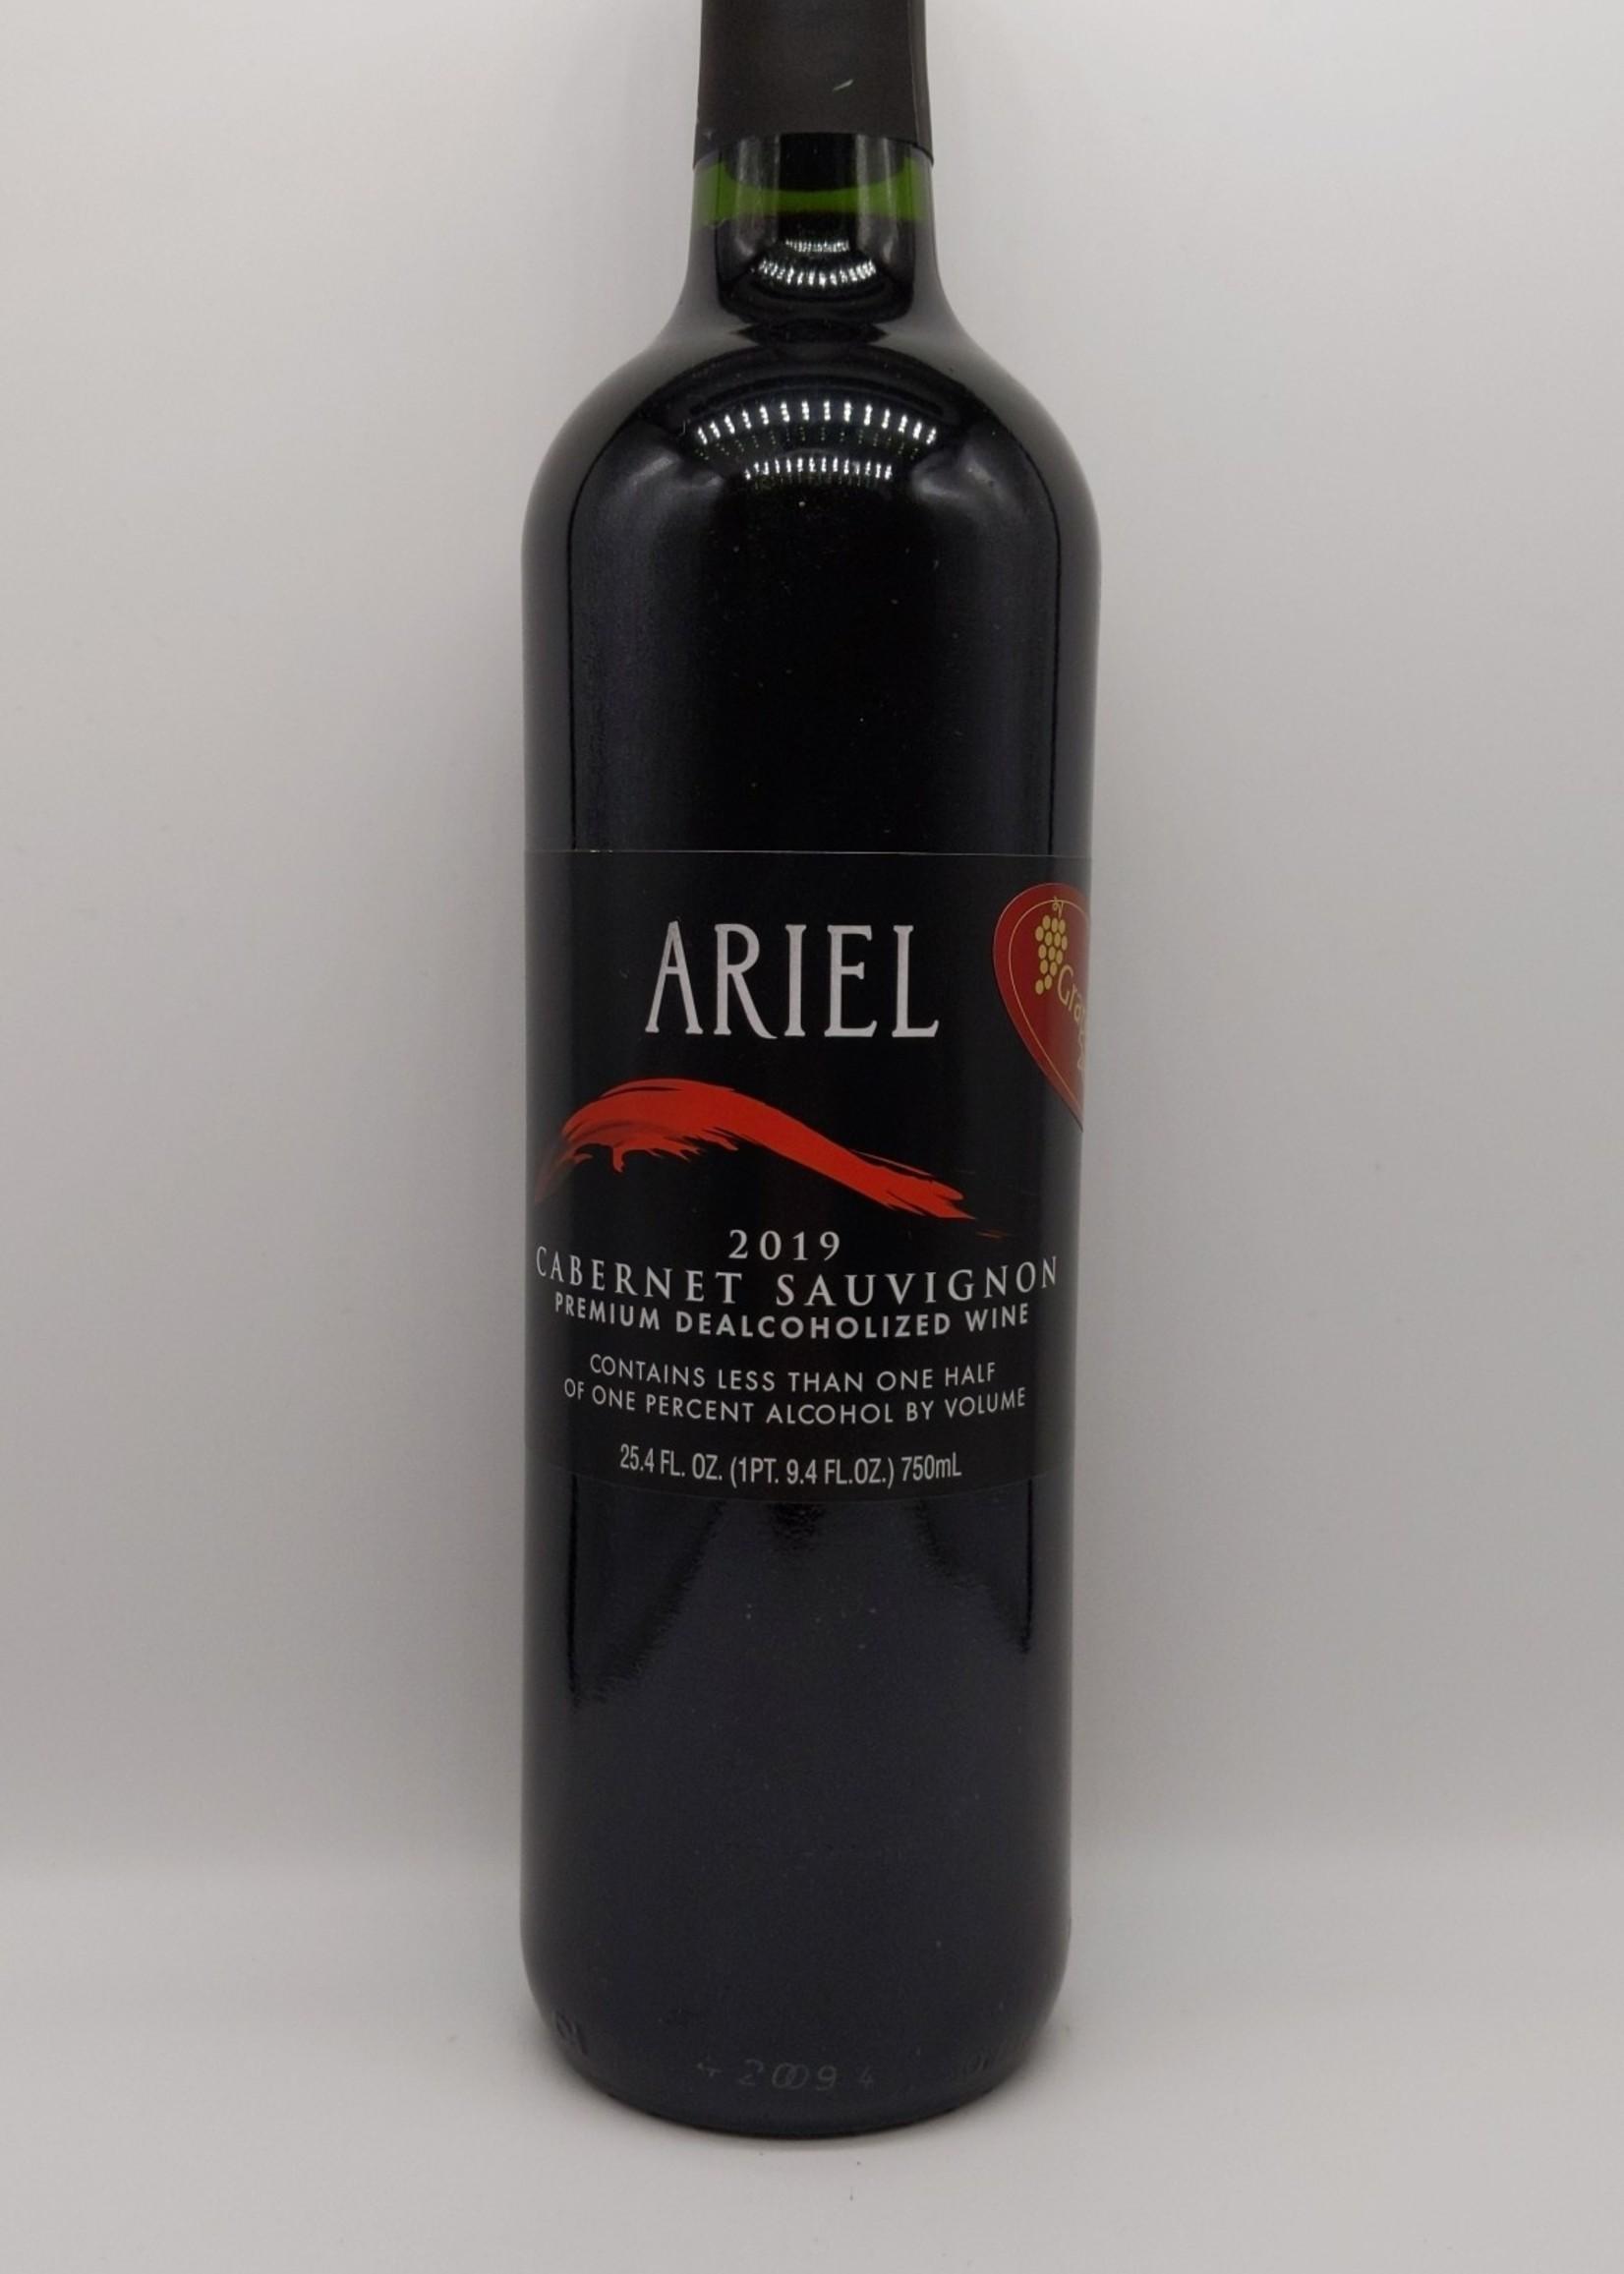 2019 ARIEL NON-ALCOHOLIC CABERNET SAUVIGNON 750ml